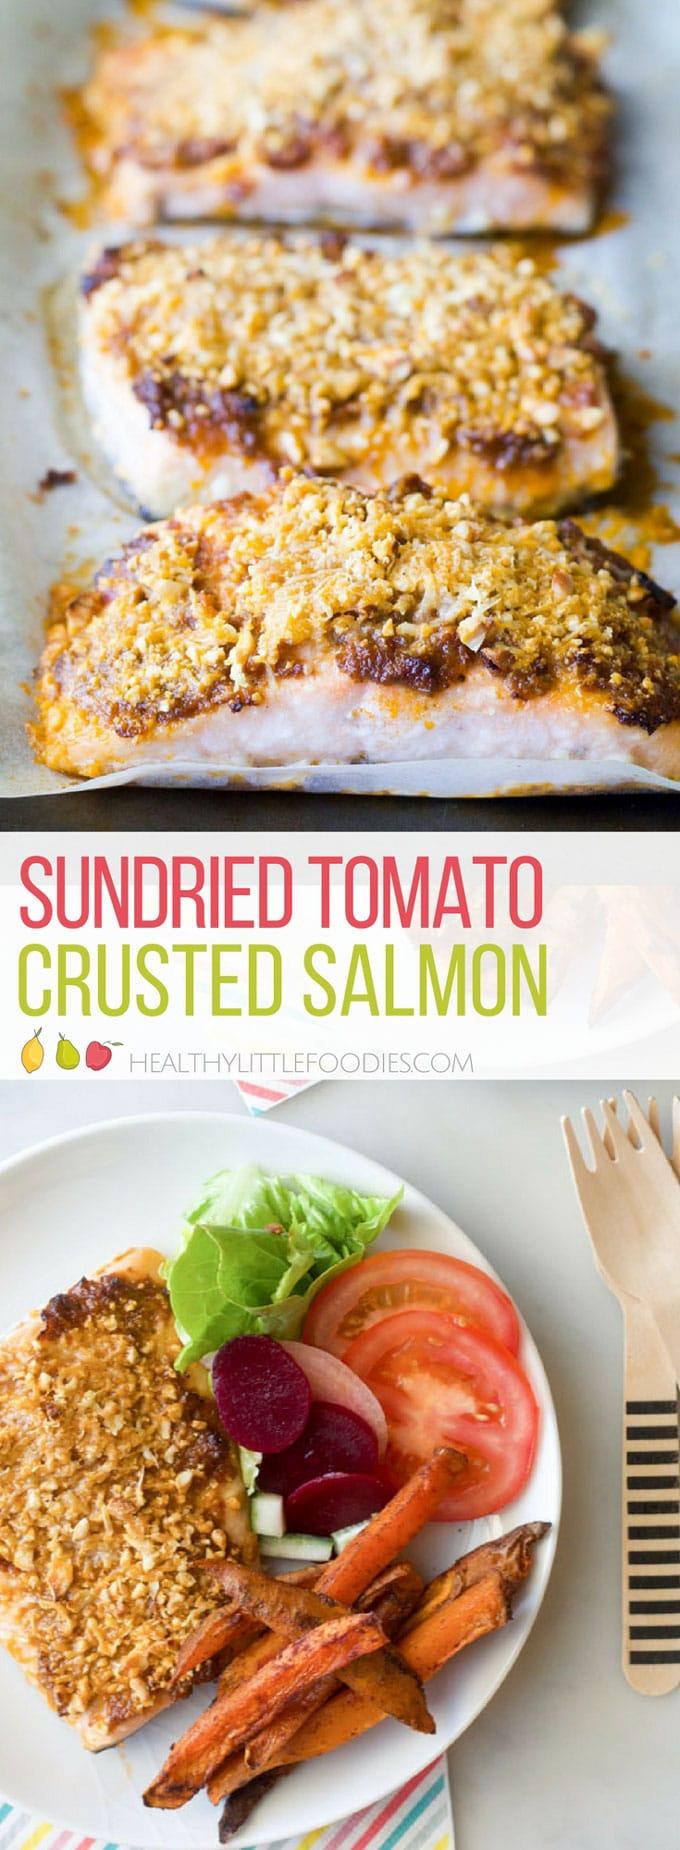 Sun-dried Tomato Crusted Salmon. Quick to prepare, easy and delicious. Kid friendly